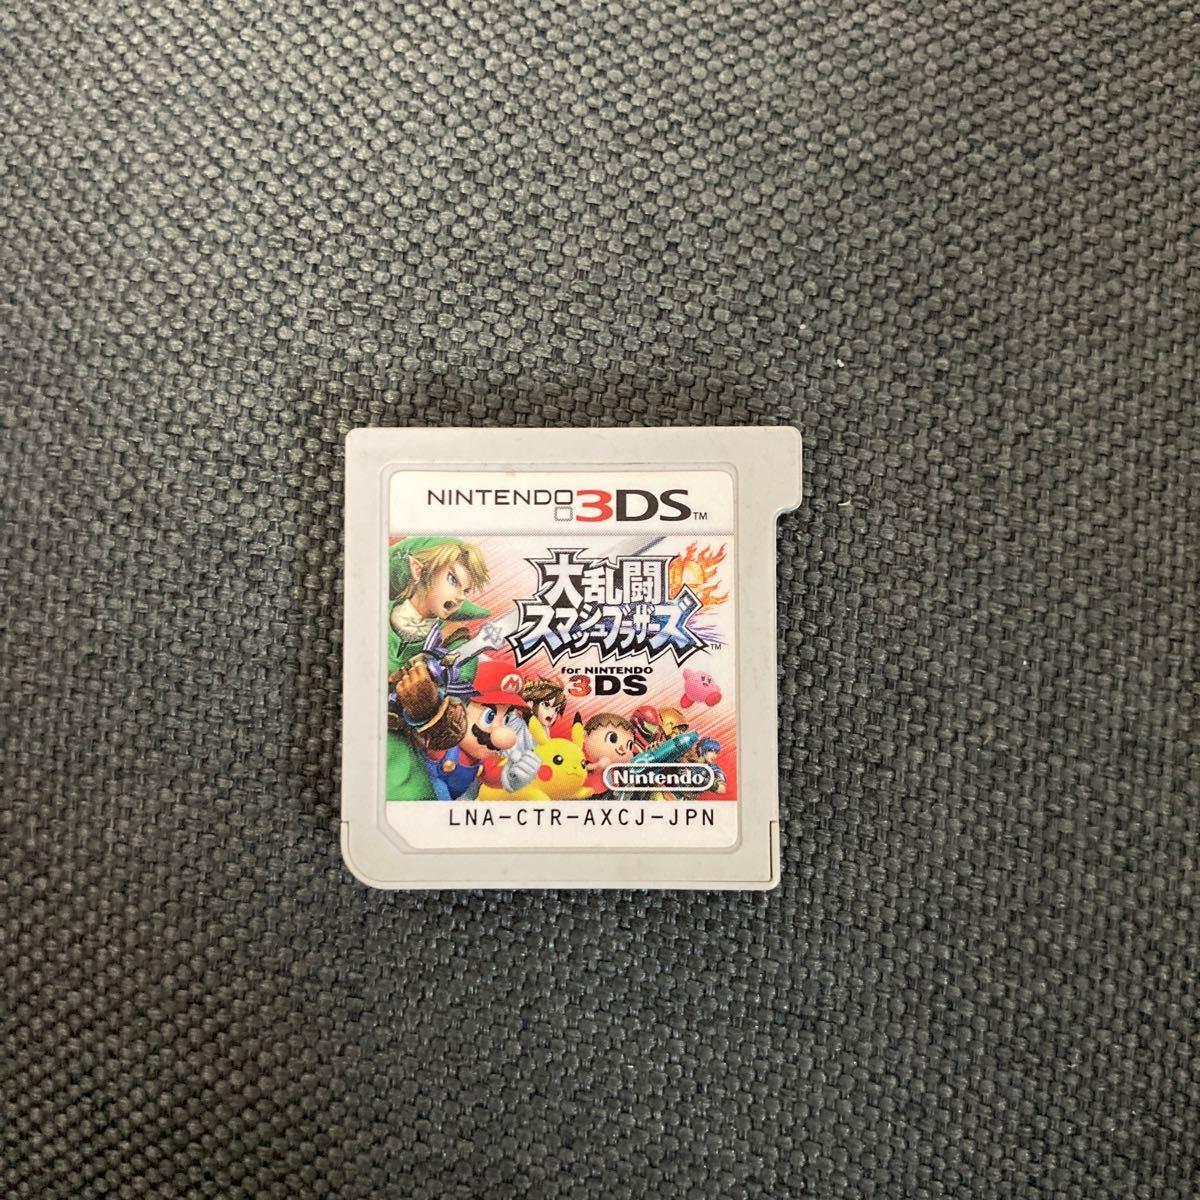 【3DS】 大乱闘スマッシュブラザーズ for Nintendo 3DS